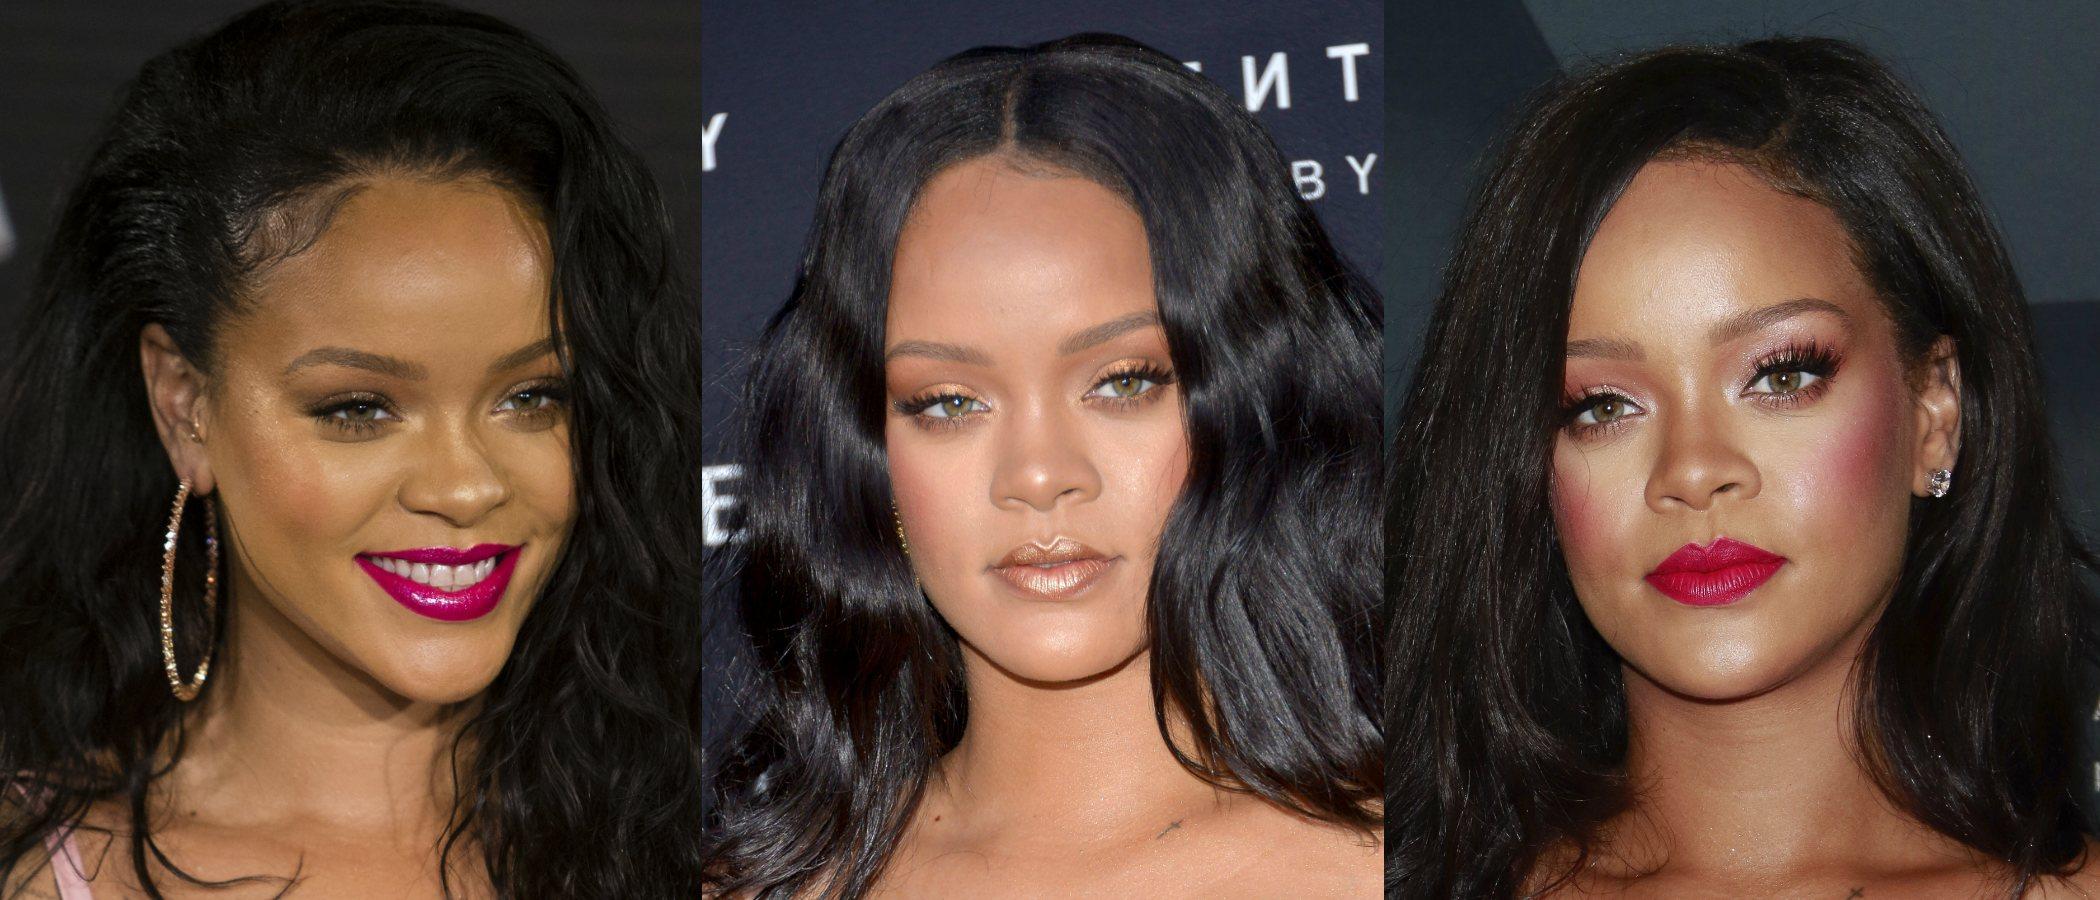 Maquíllate como Rihanna